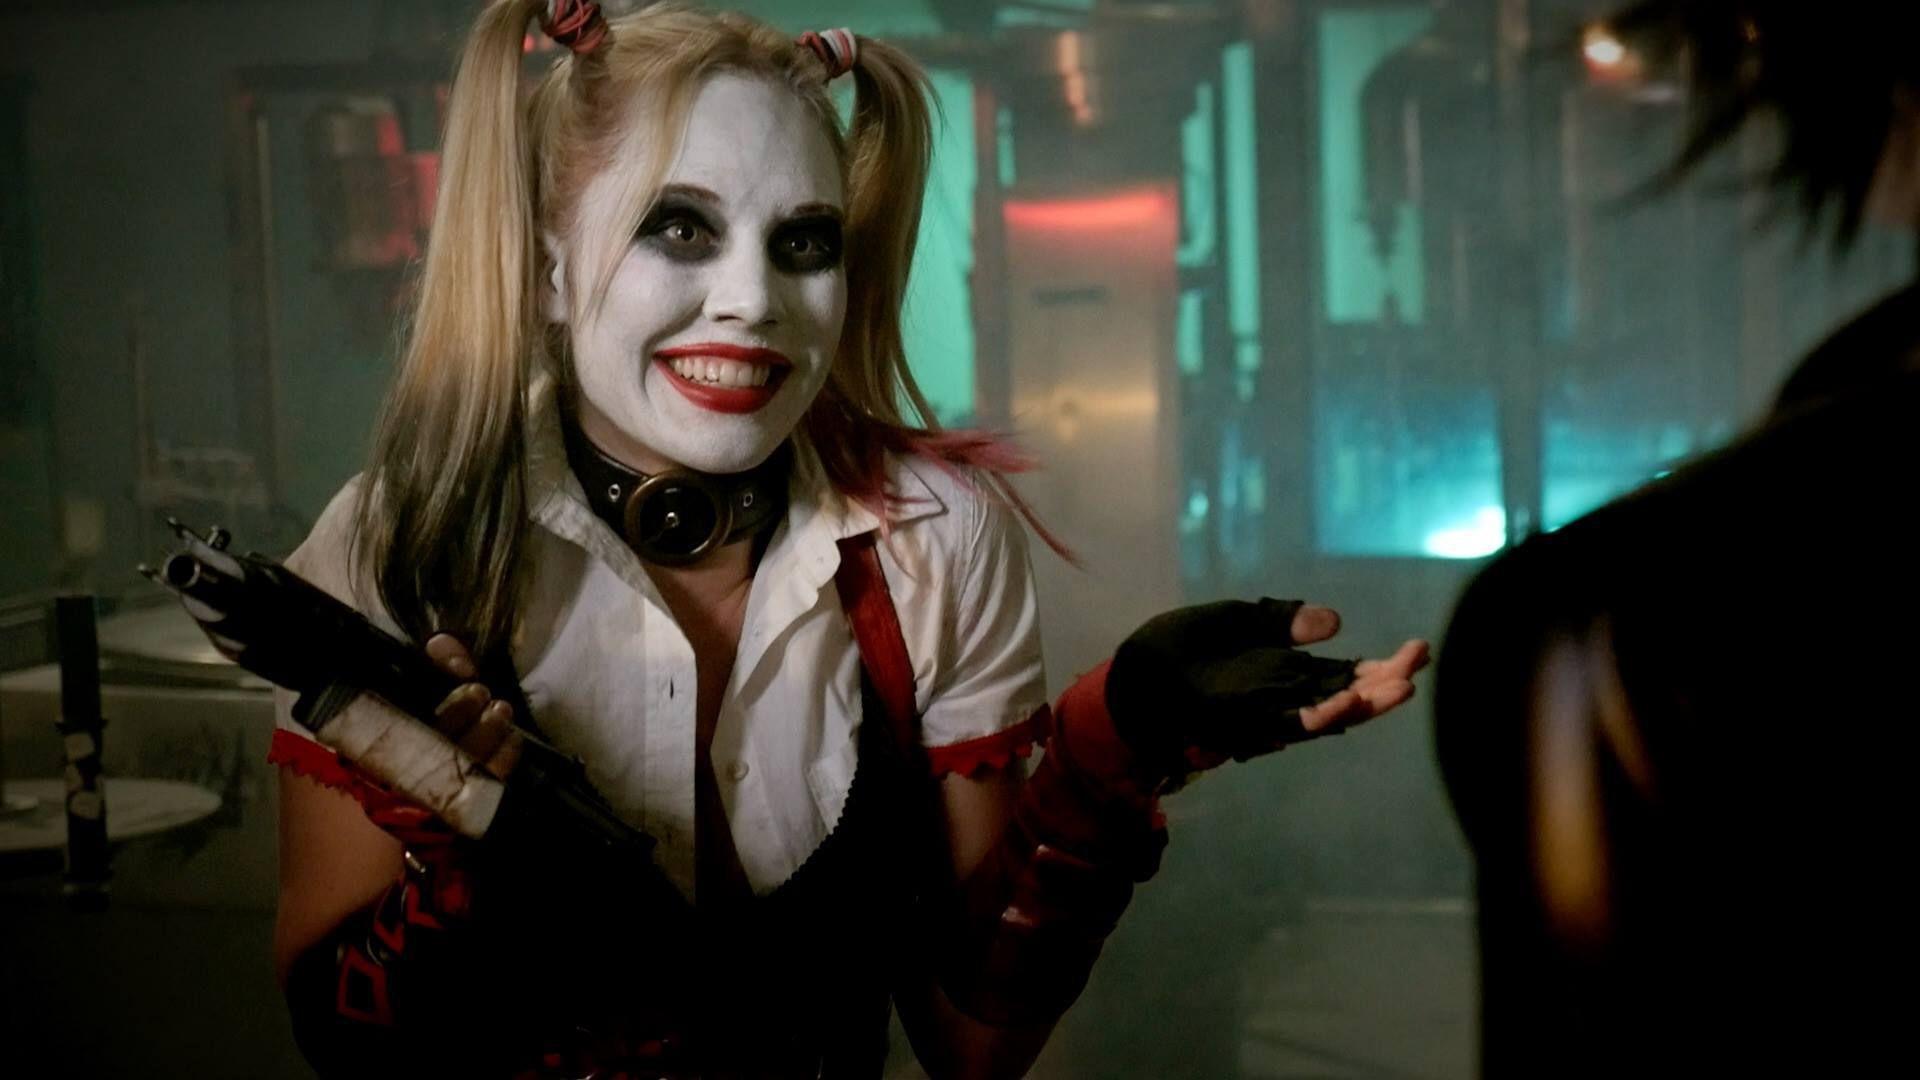 Joker And Harley Quinn Wallpapers Tatiana Dekhtyar Harley